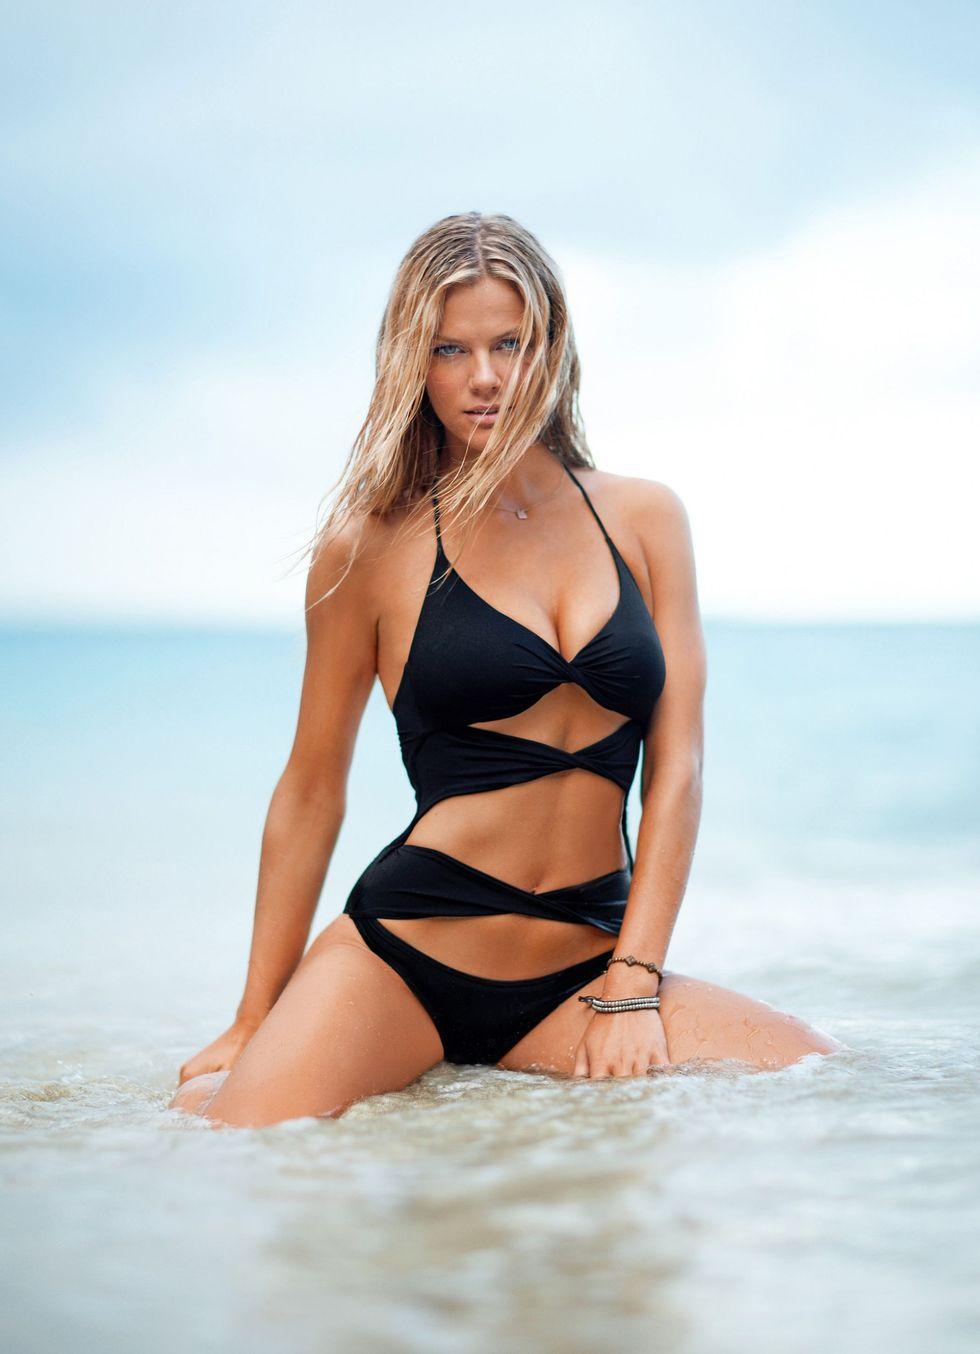 brooklyn-decker-victorias-secret-swimsuit-2010-photoshoot-01